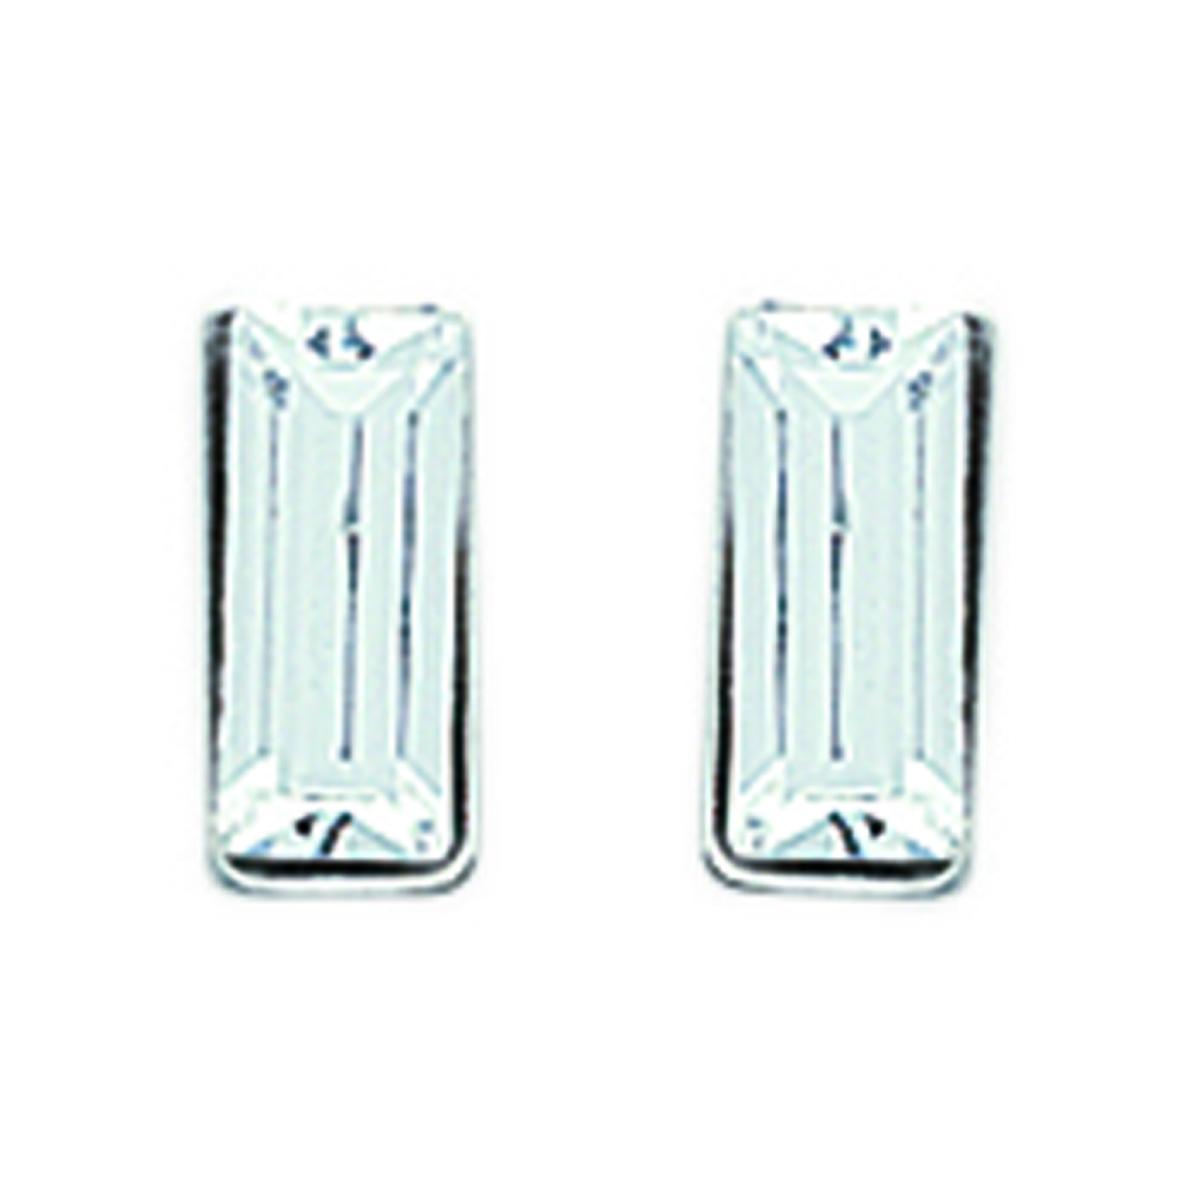 Brillants Rectangle Blanc Argent - 3x7 mm - [F3932]